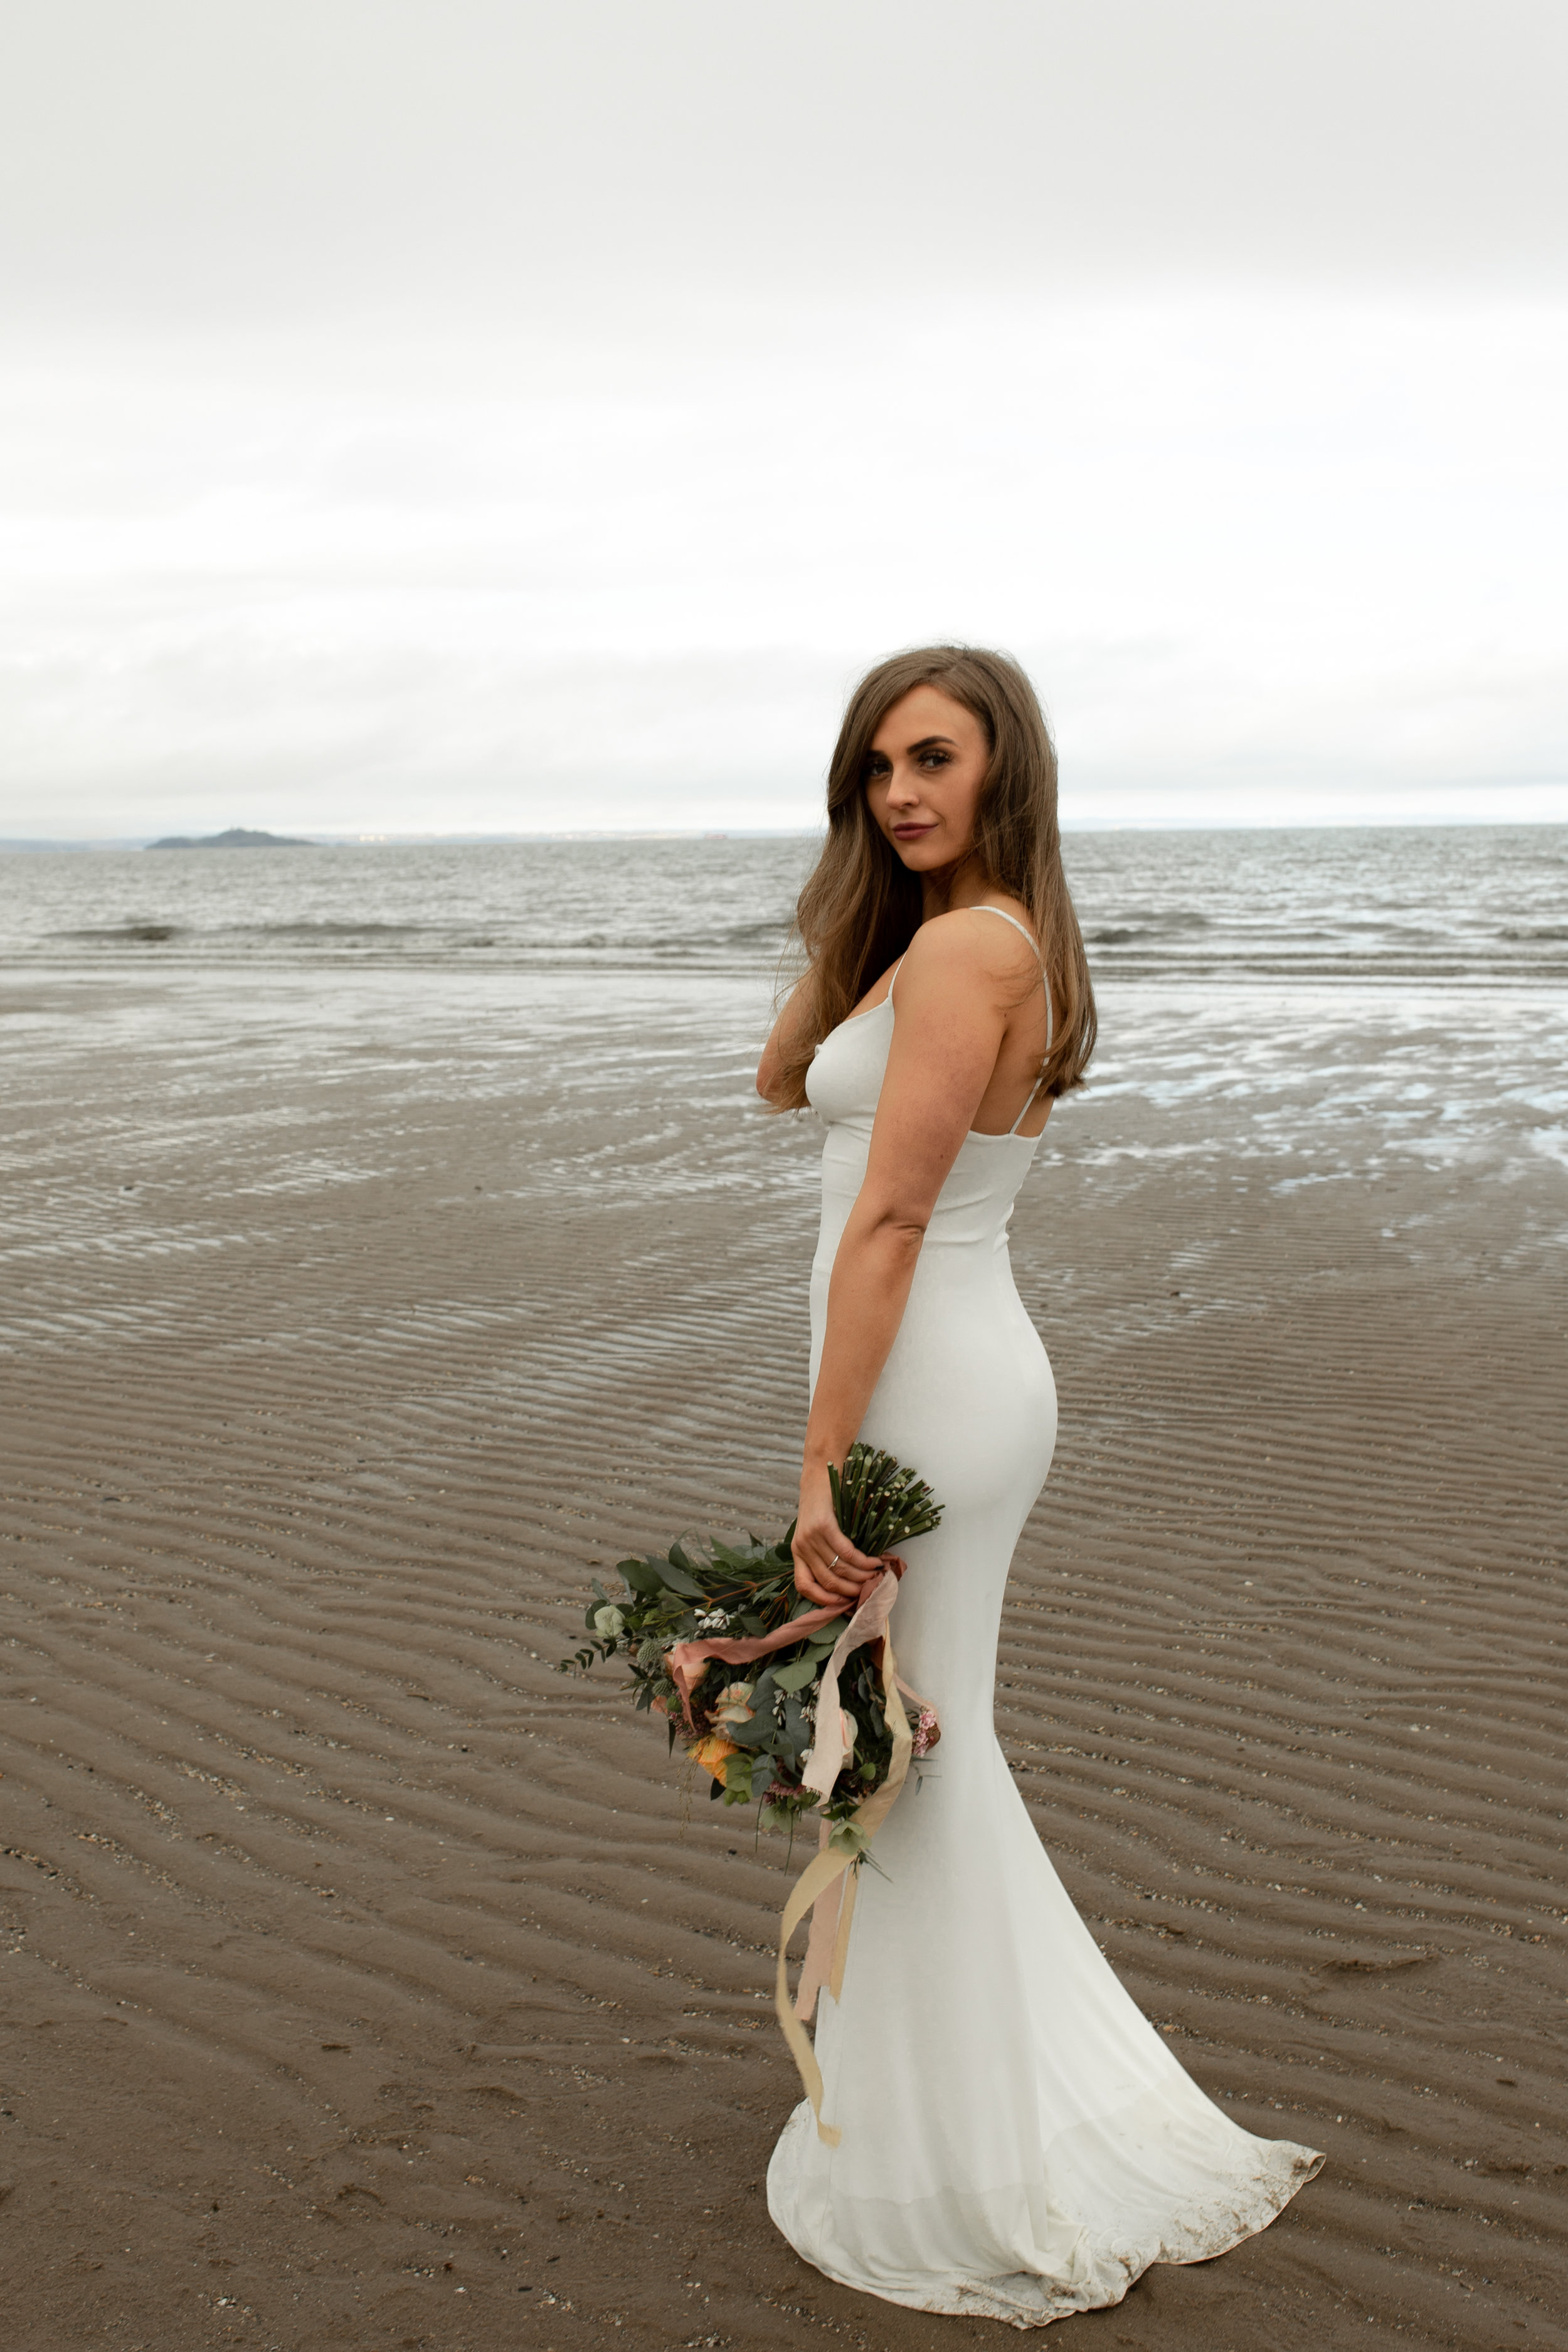 Paula_Russell_Photography_Edinburgh_Wedding_BBonnie_Flowers_11